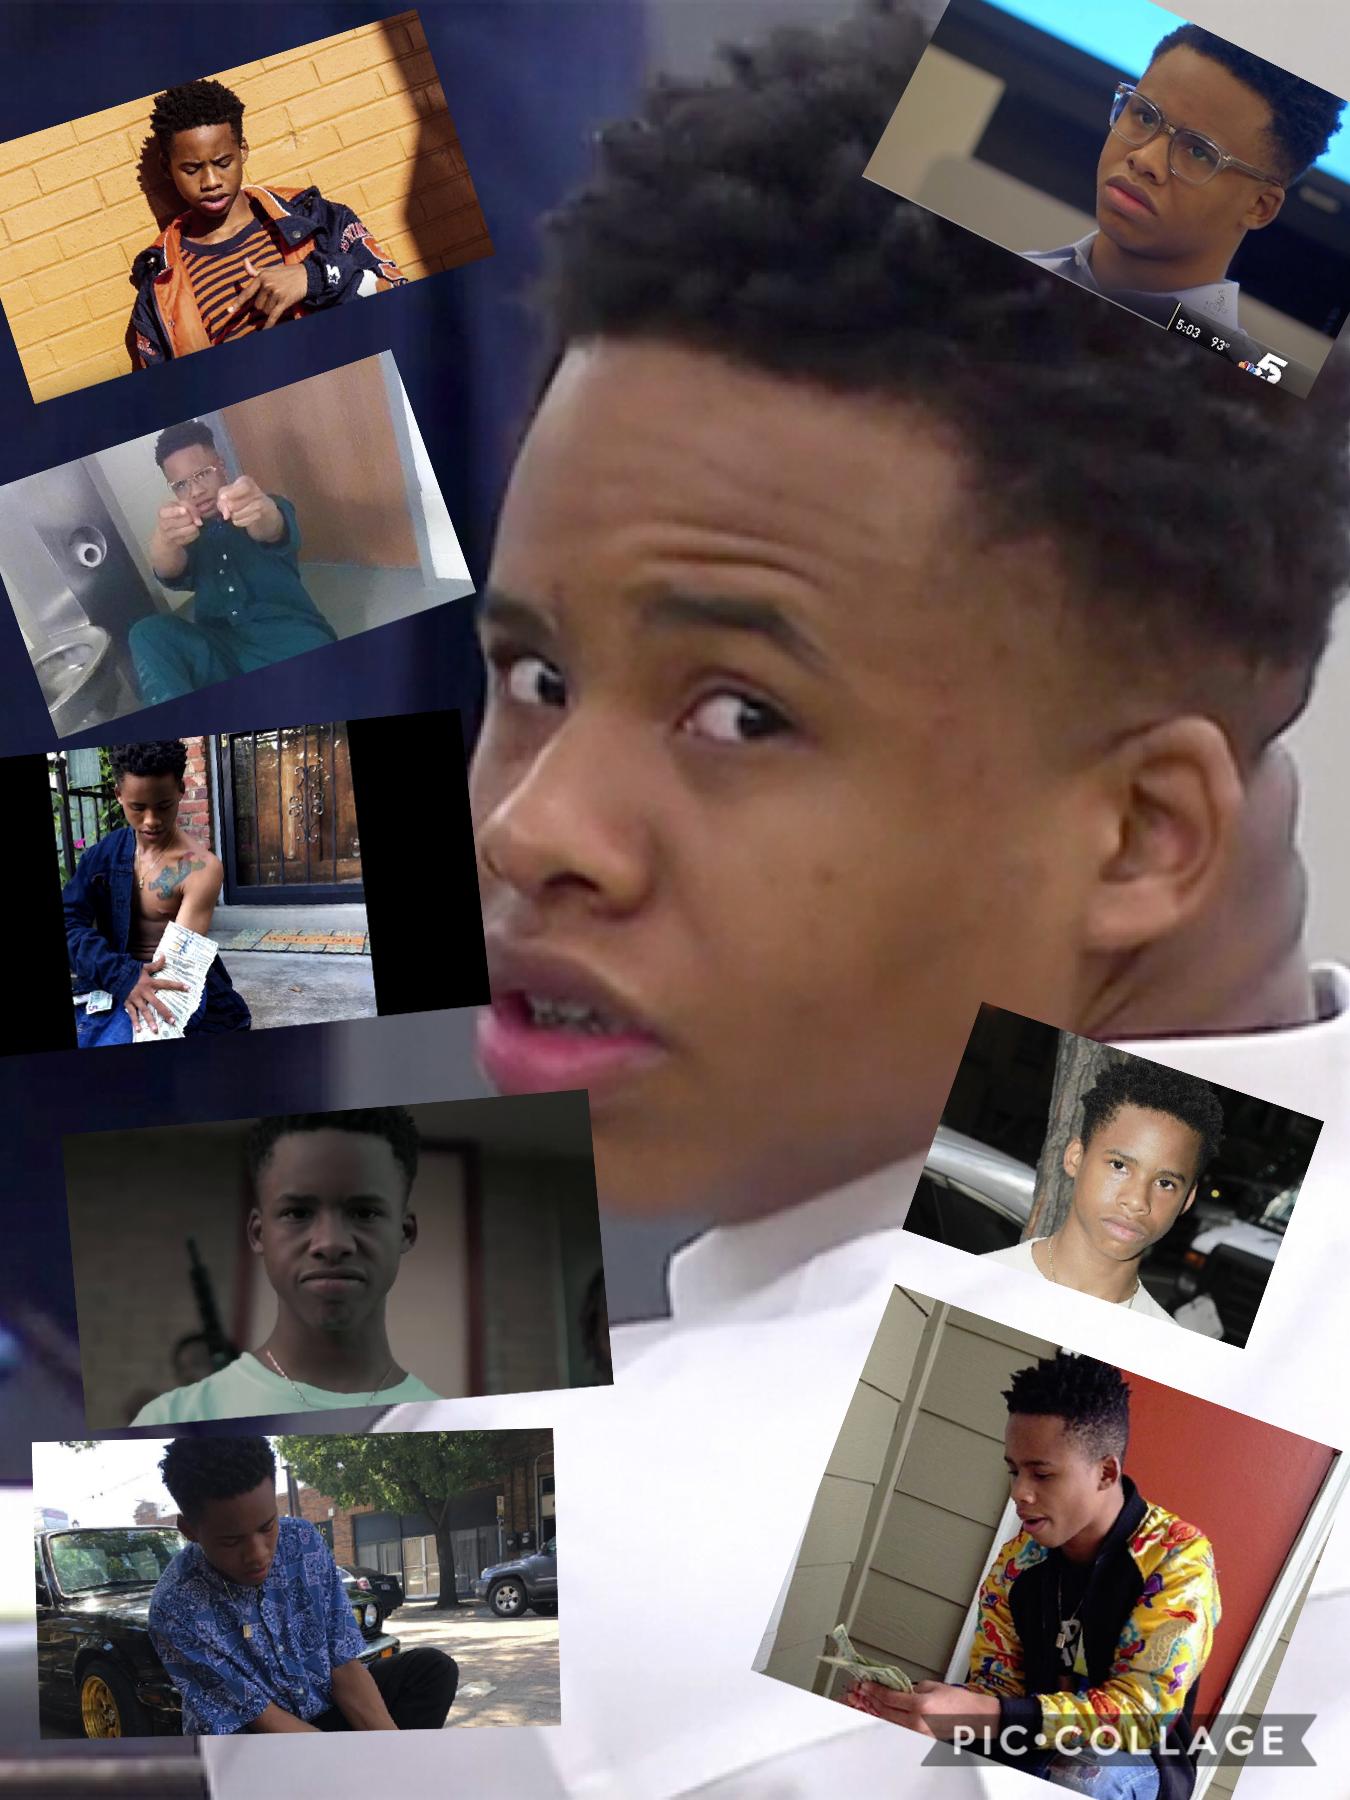 Collage by Stitch_david